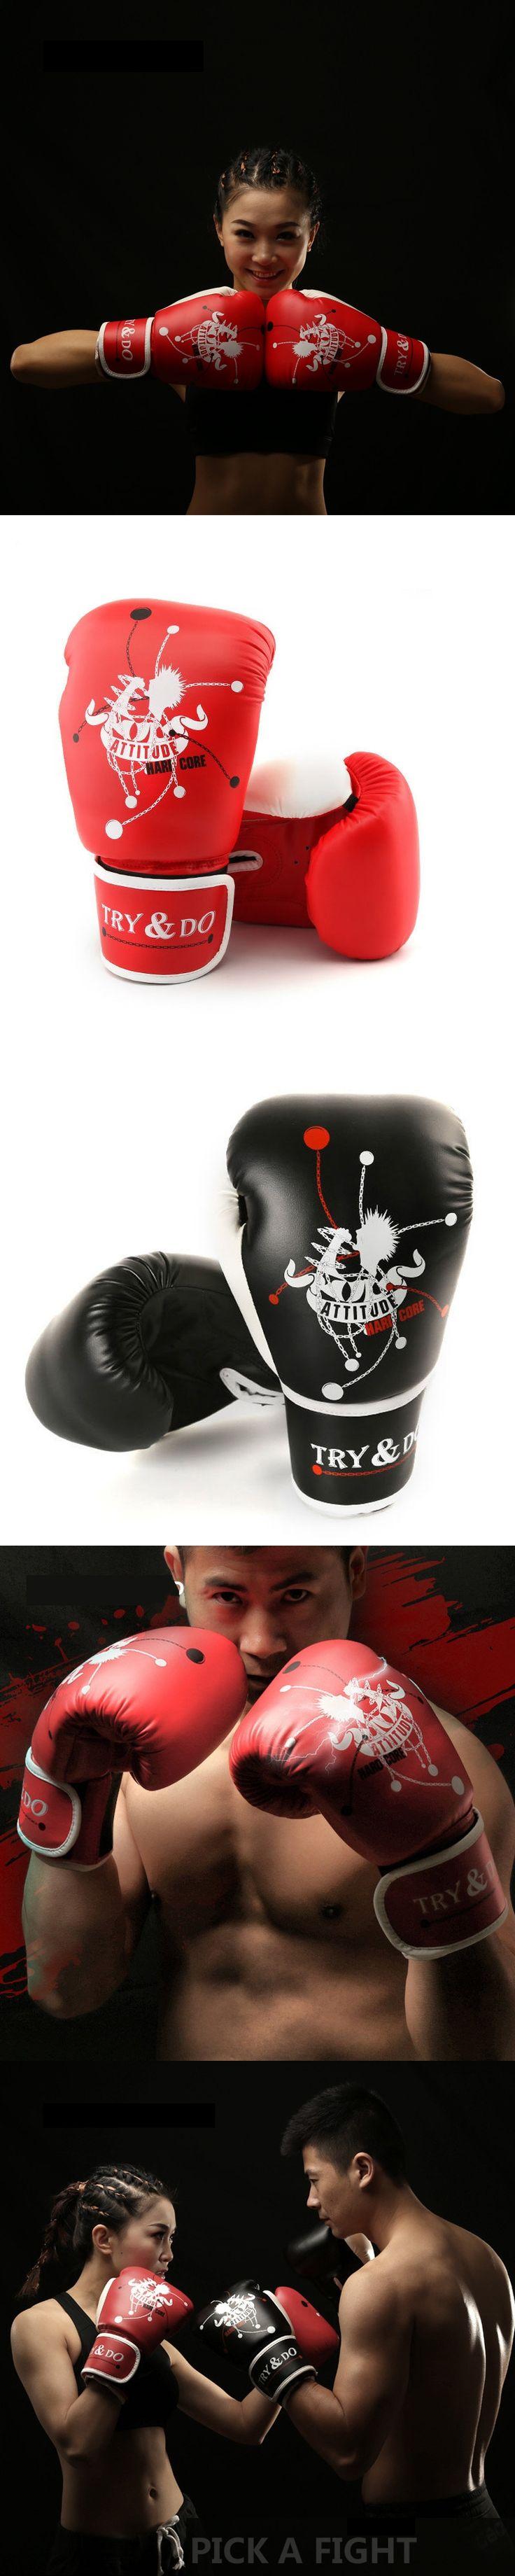 2017 hot MUAY THAI PU LEATHER BOXING GLOVES FOR MEN WOMEN TRAINING IN MMA GRANT BOX GLOVES  10OZ:48KG-55KG;    12OZ:57KG-86KG